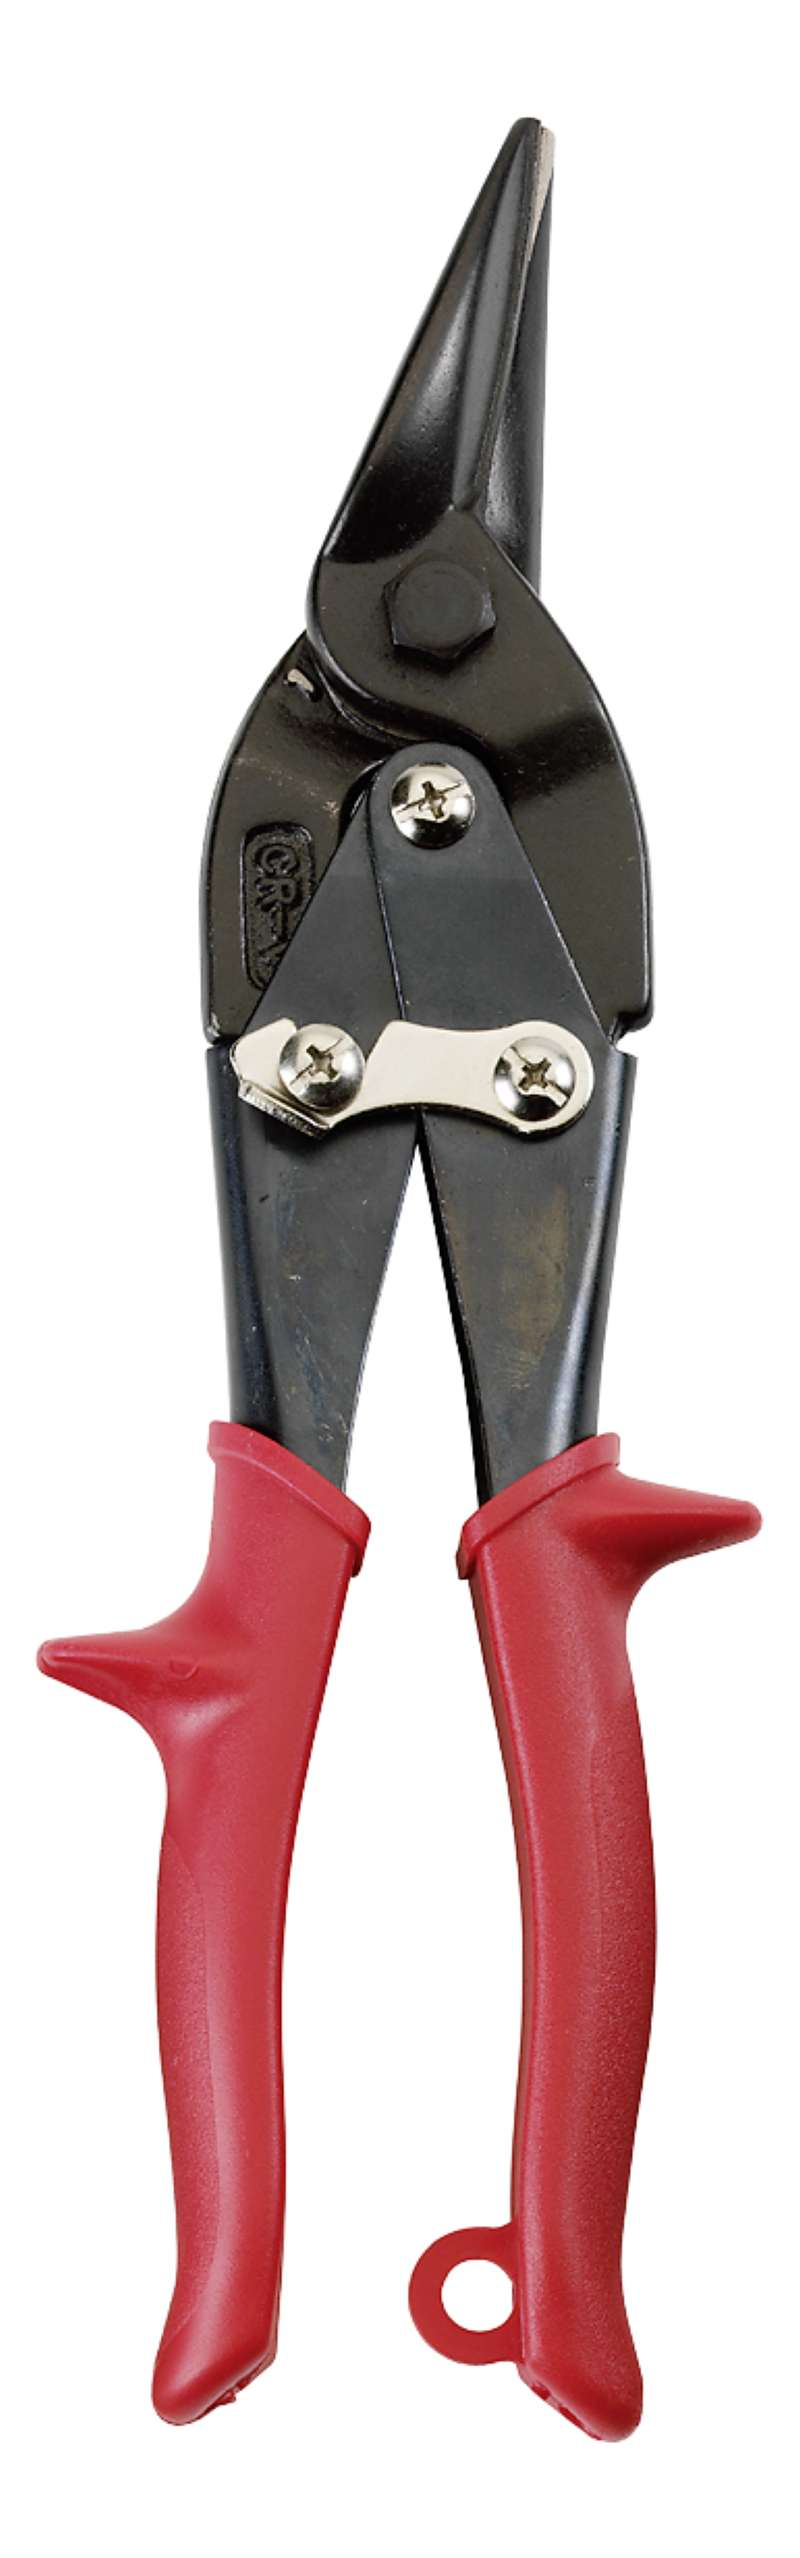 Ножницы по металлу Kwb